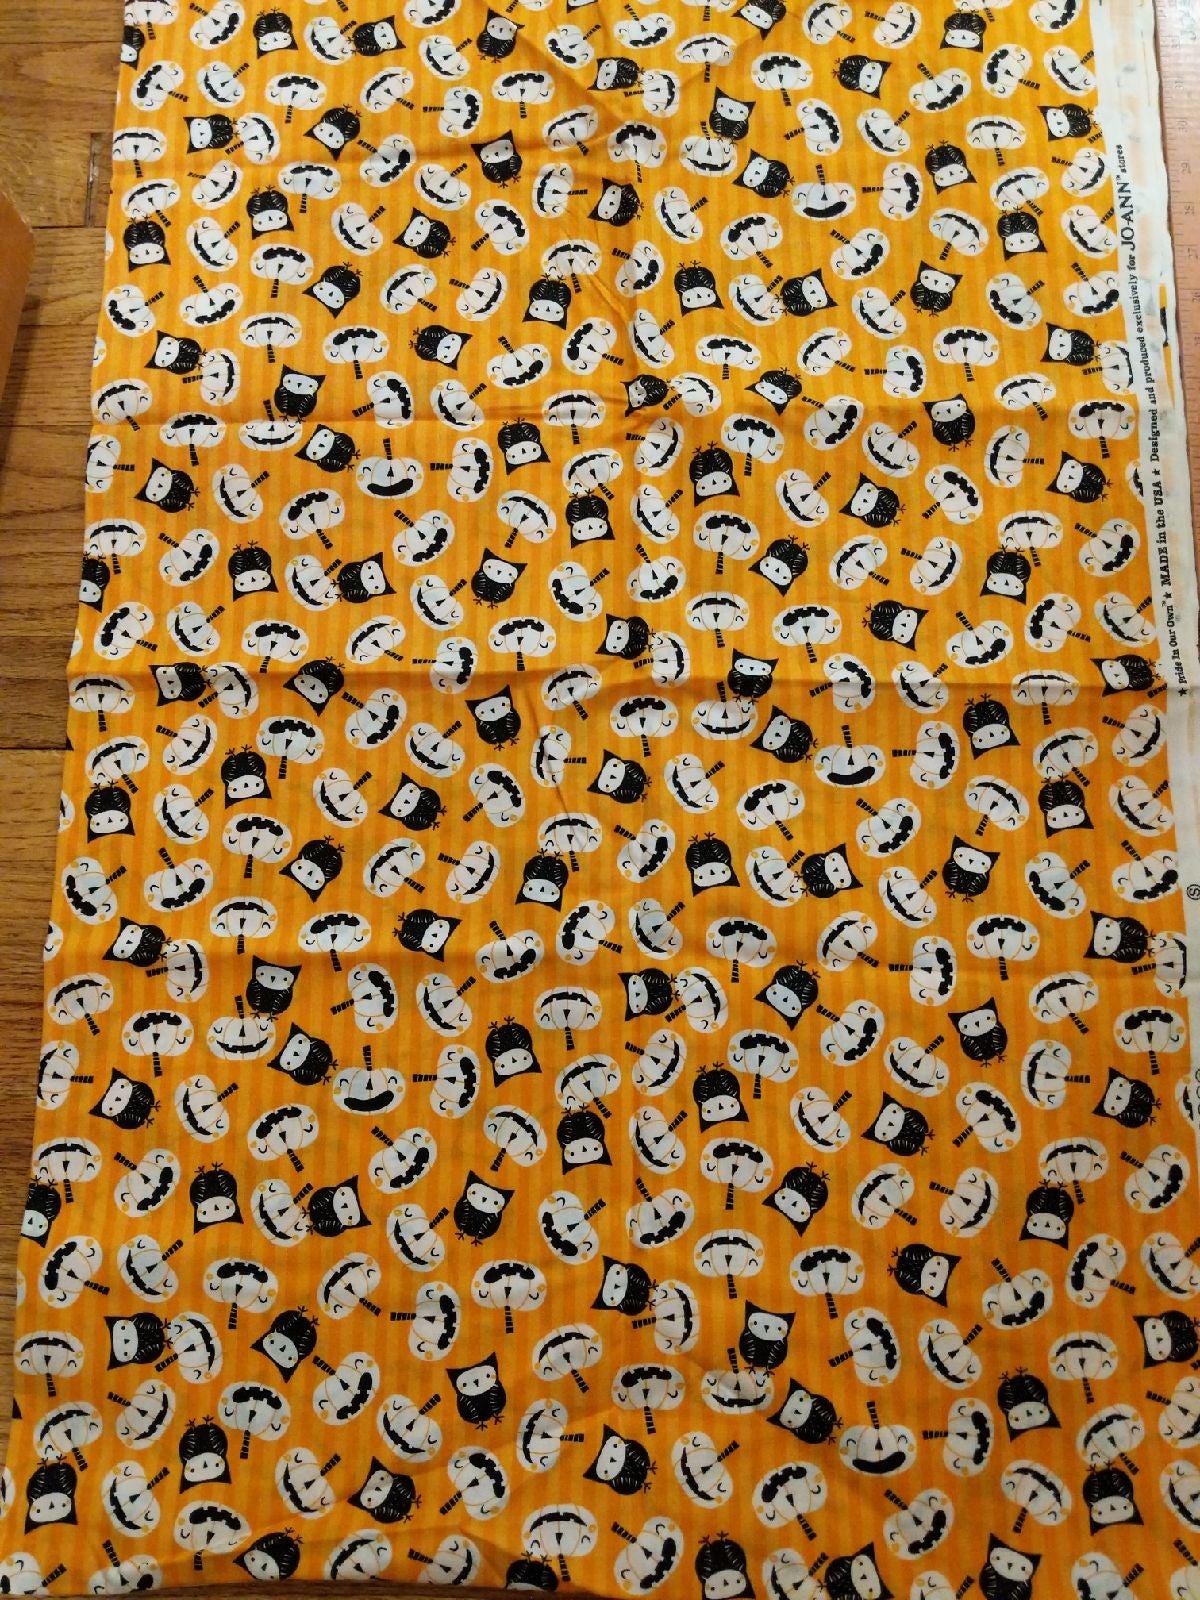 Halloween jack-o'-lantern fabric